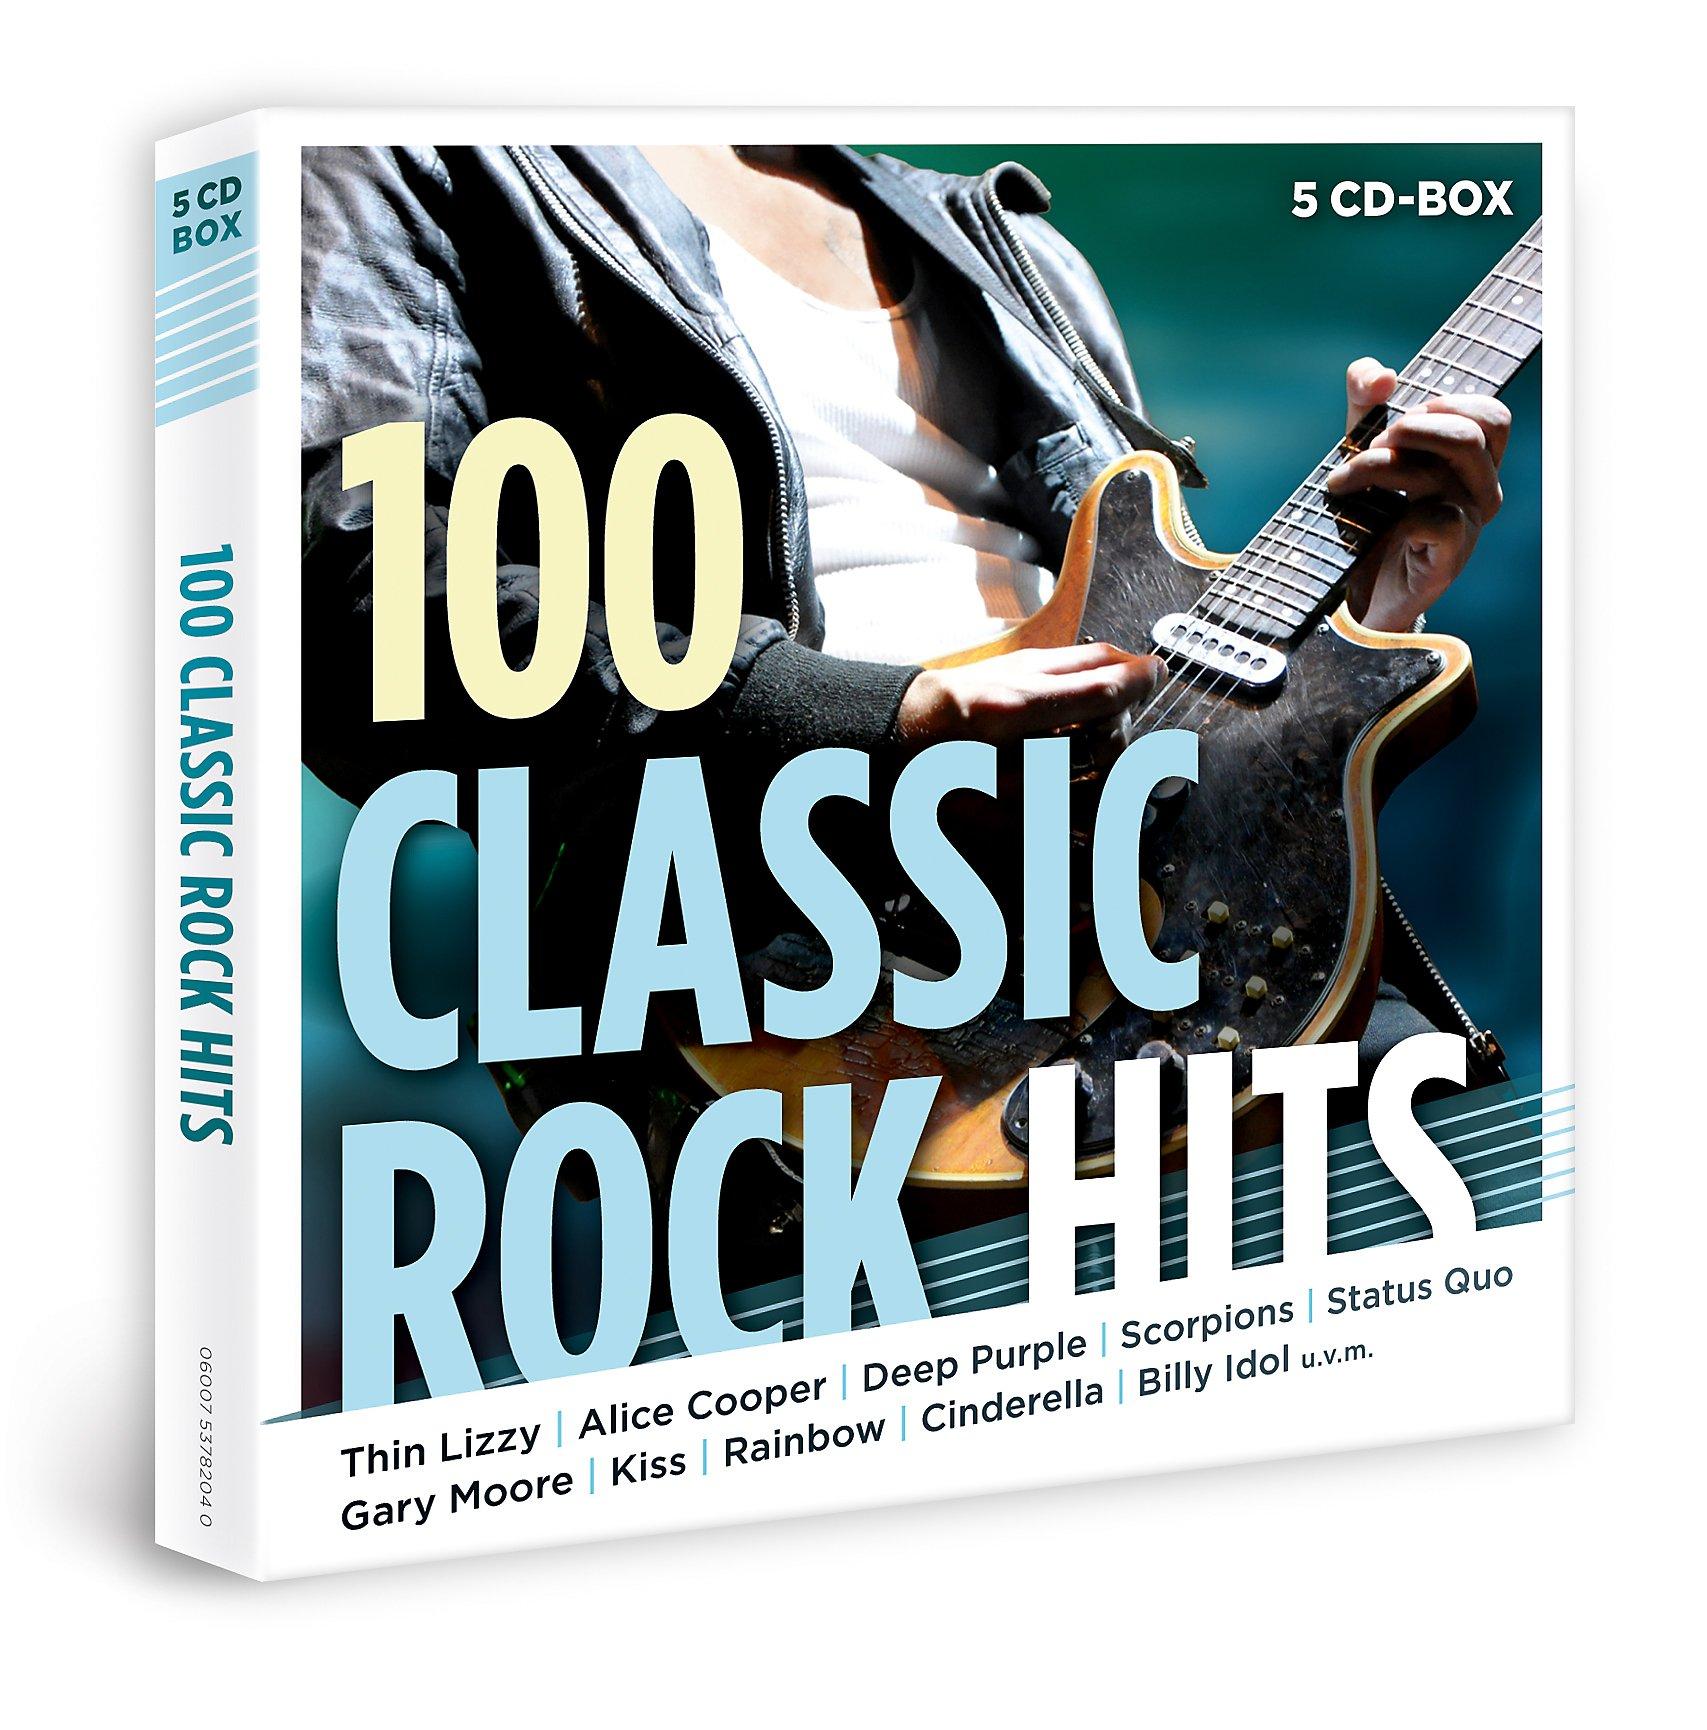 100 classic rock hits exklusive 5cd box